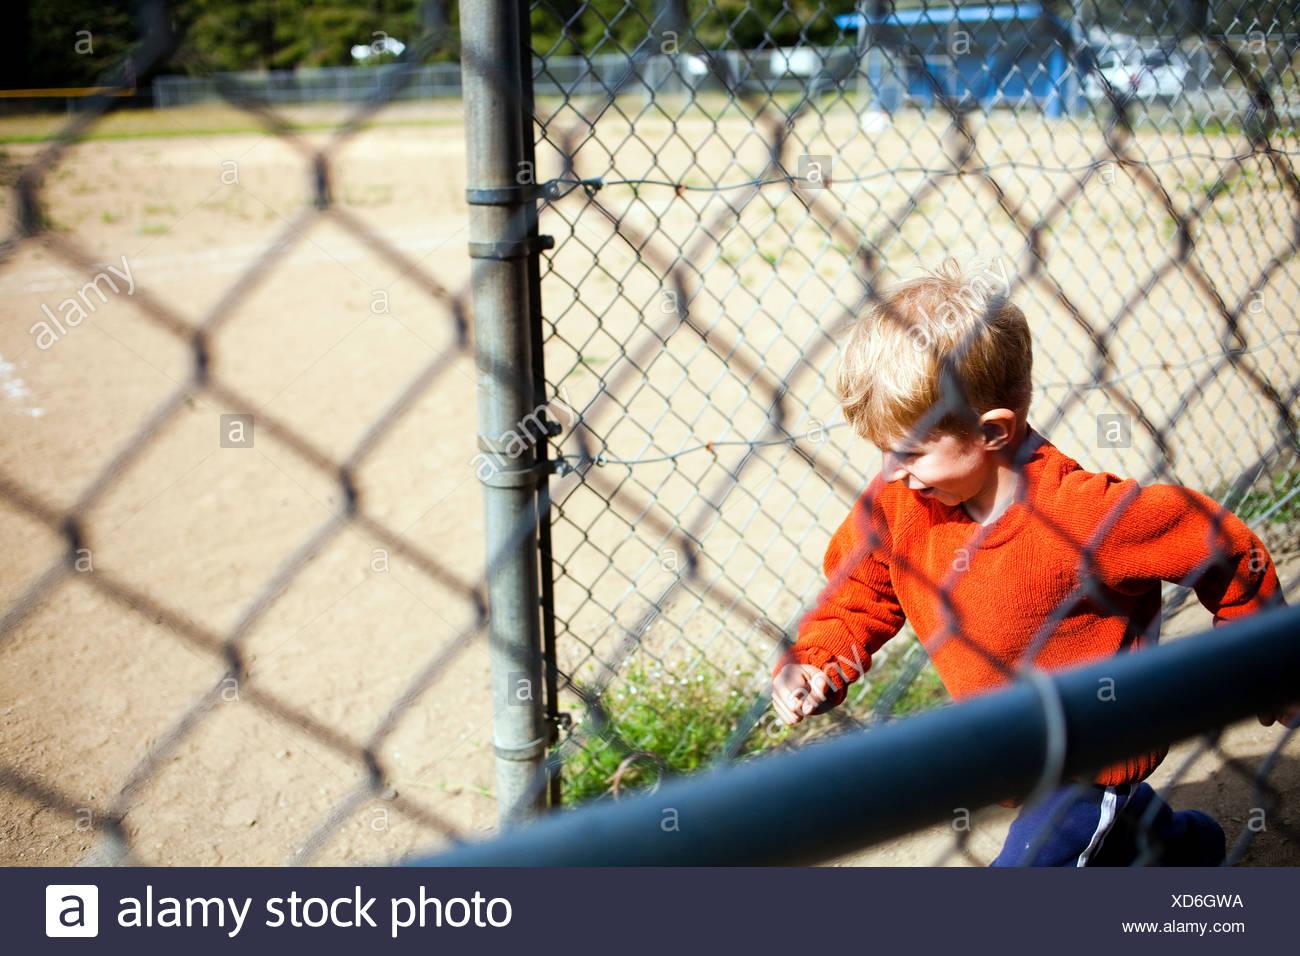 Young boy running onto baseball field - Stock Image